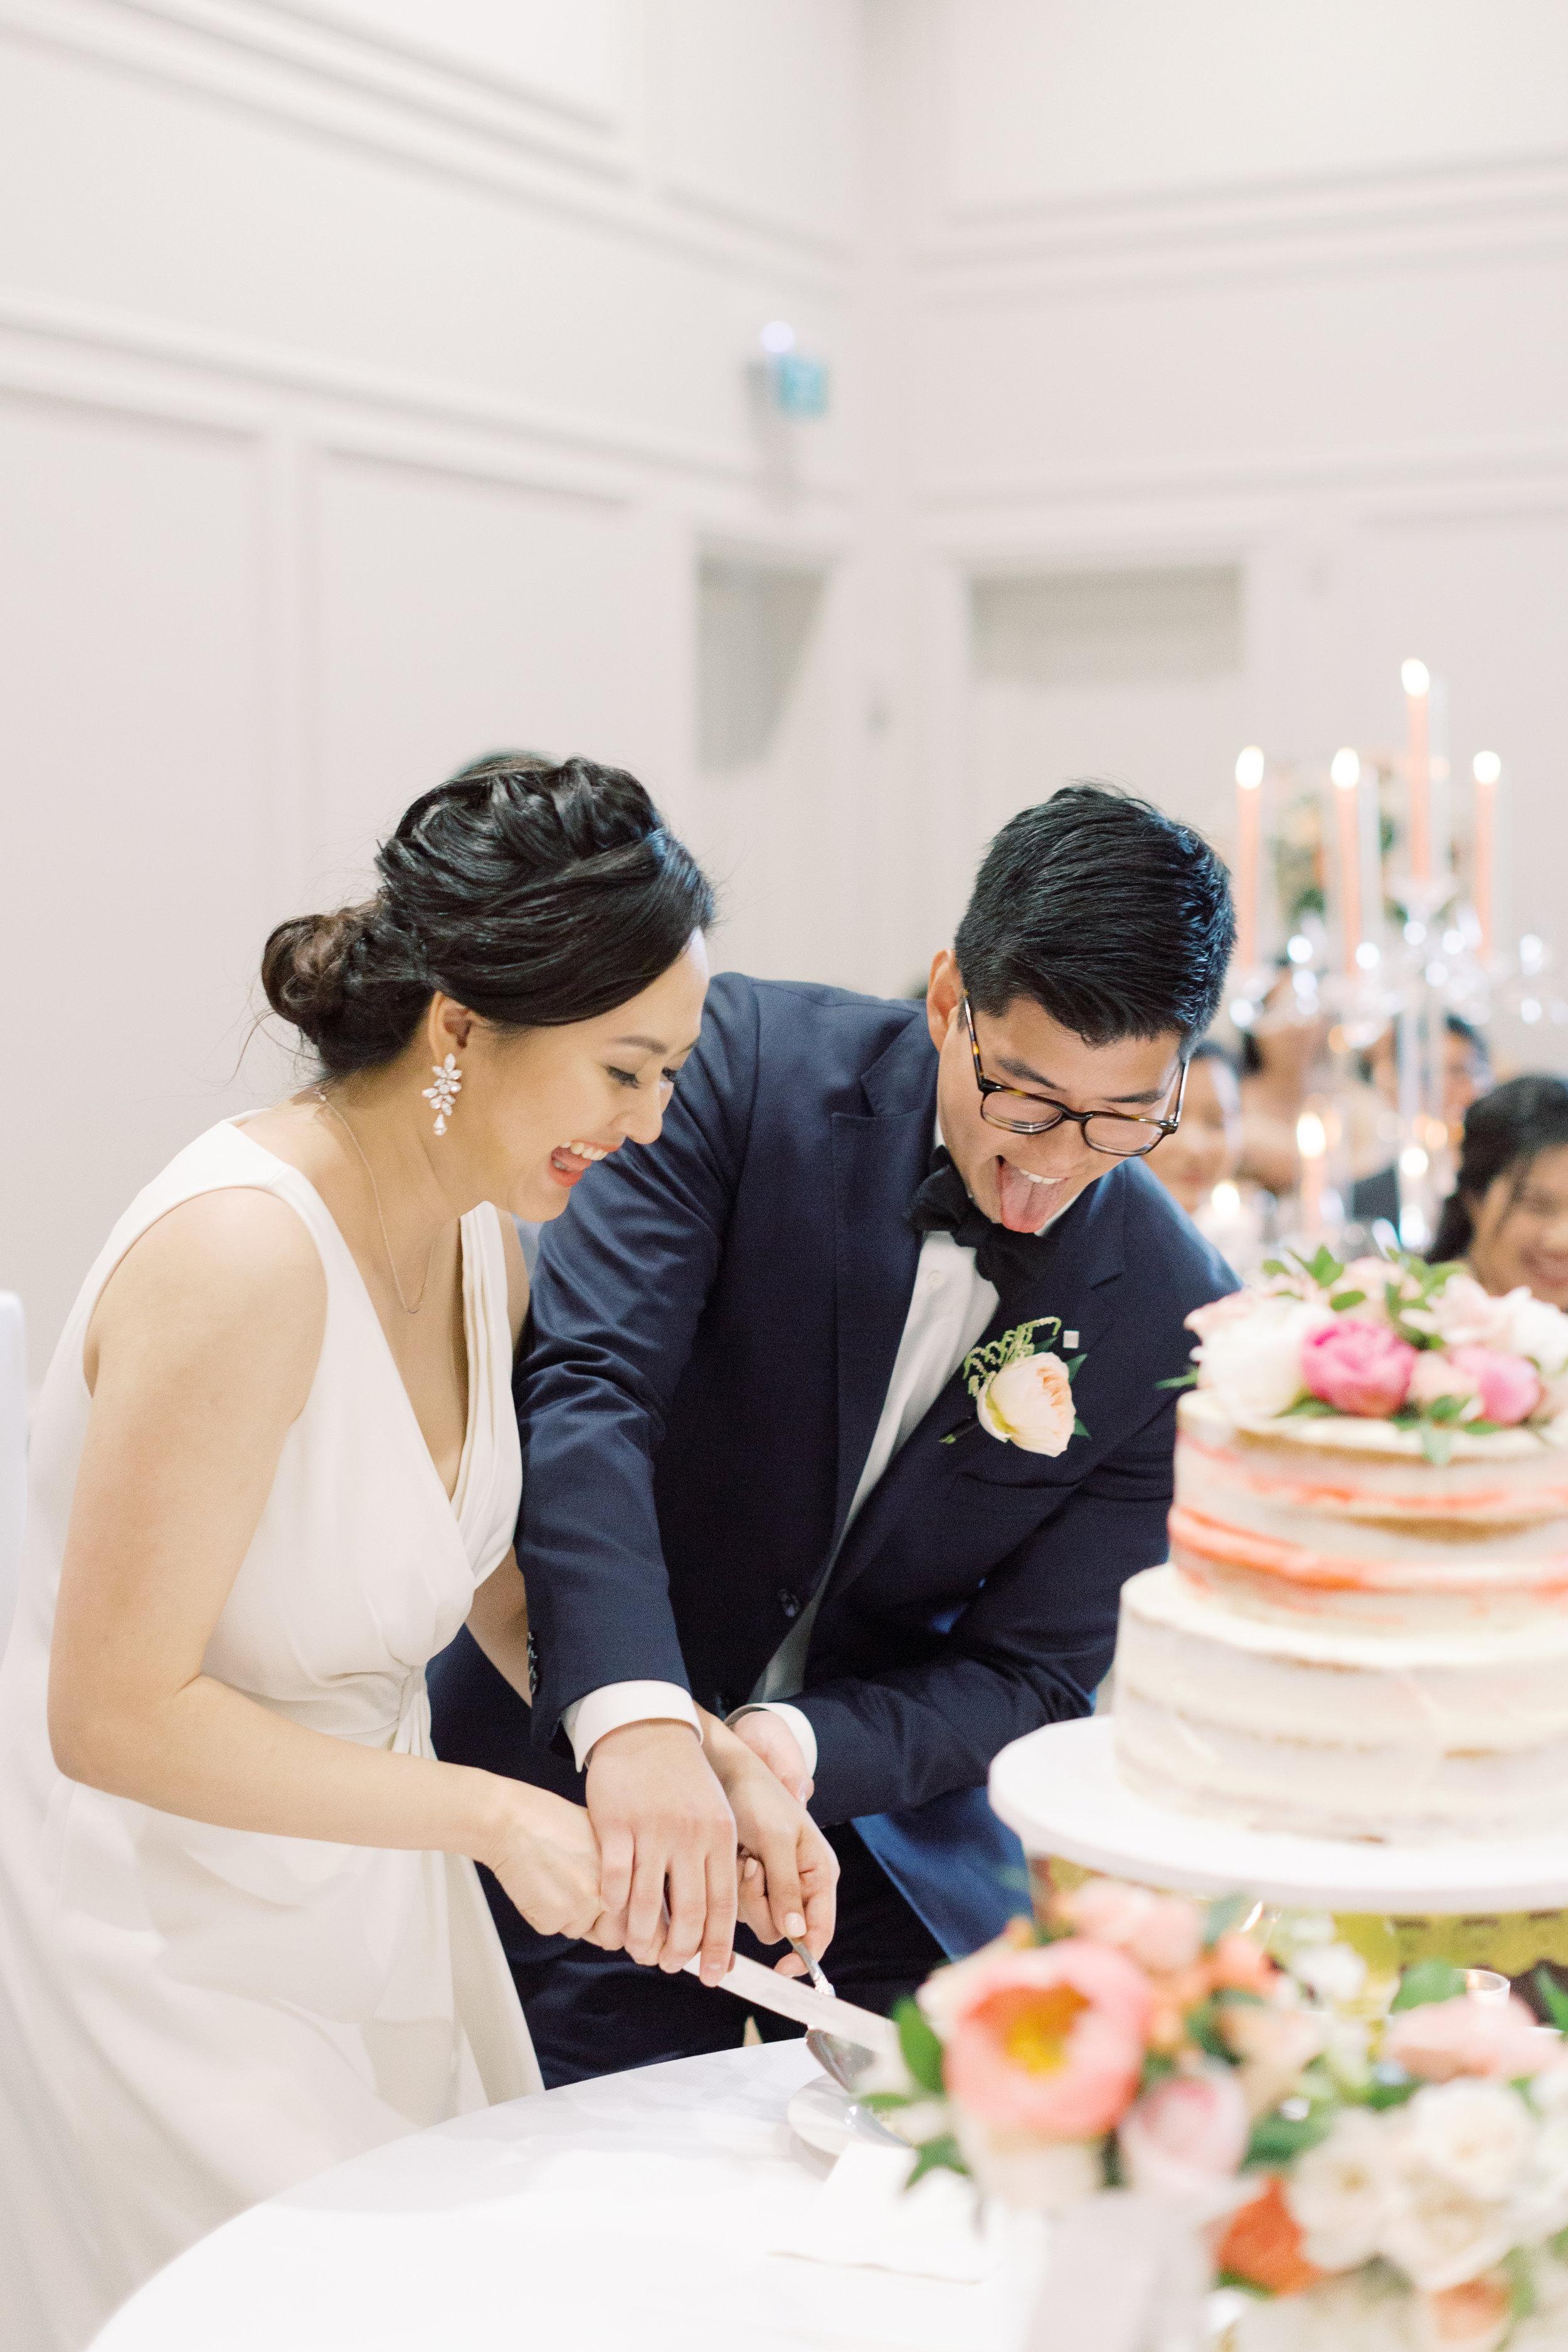 Arlington Estate Wedding - Reception-70.jpg